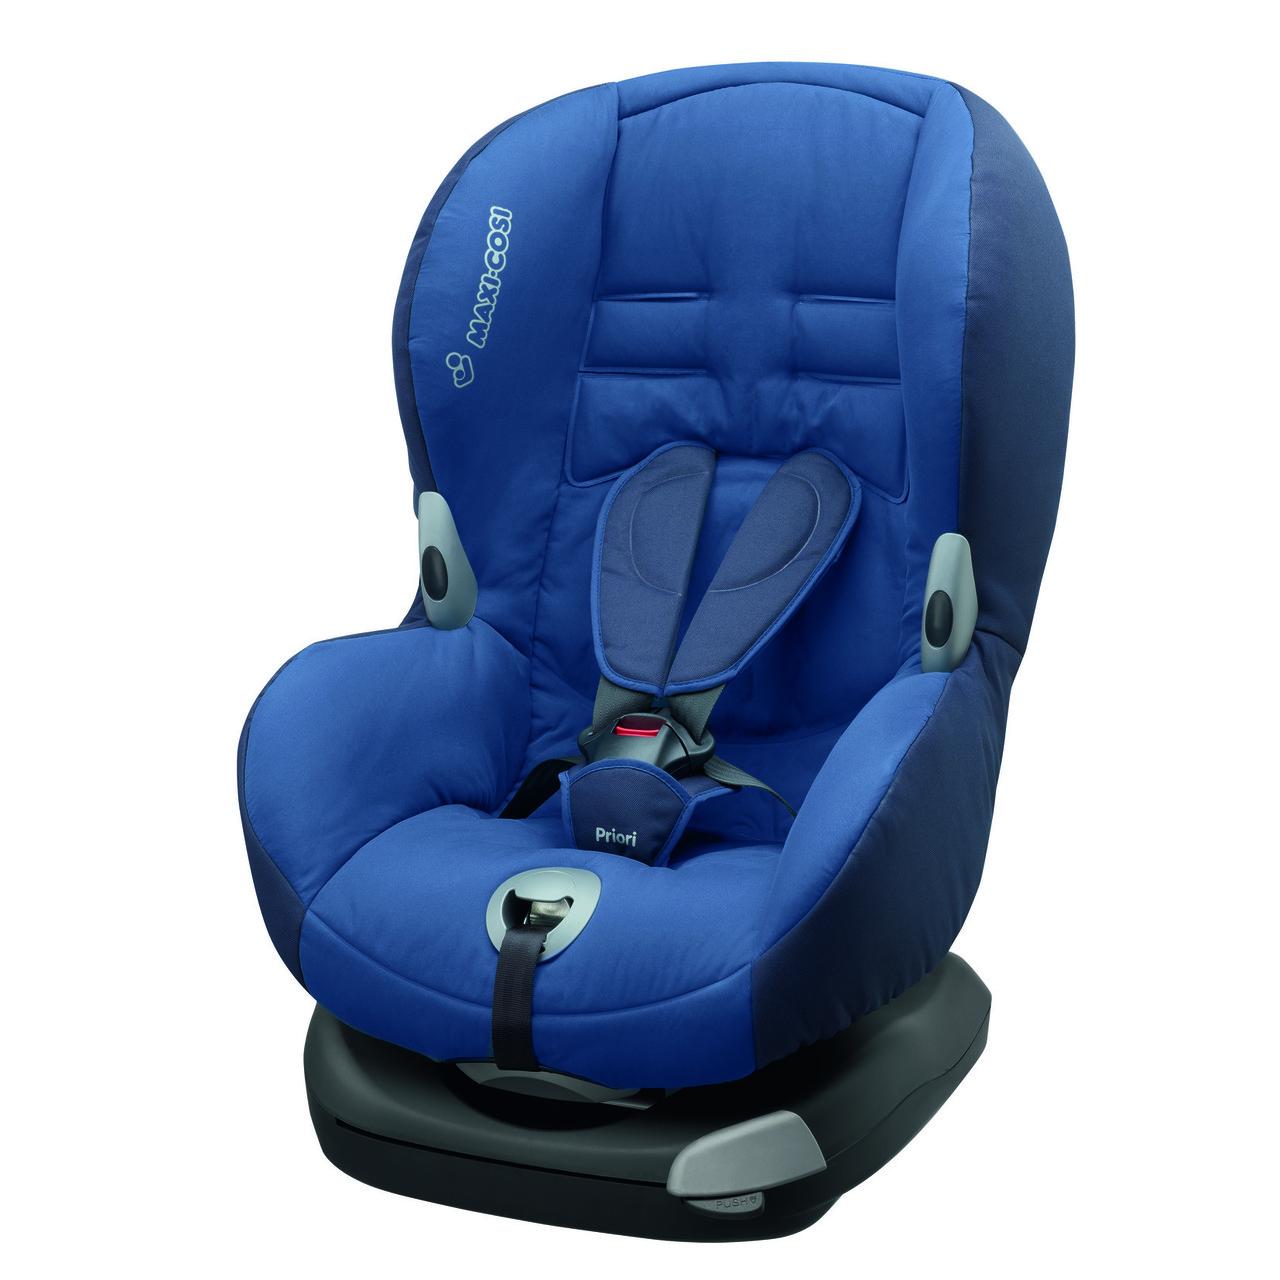 Автокресло Maxi Cosi Priori XP 9-18 кг (64106120) Blue Night (синий)